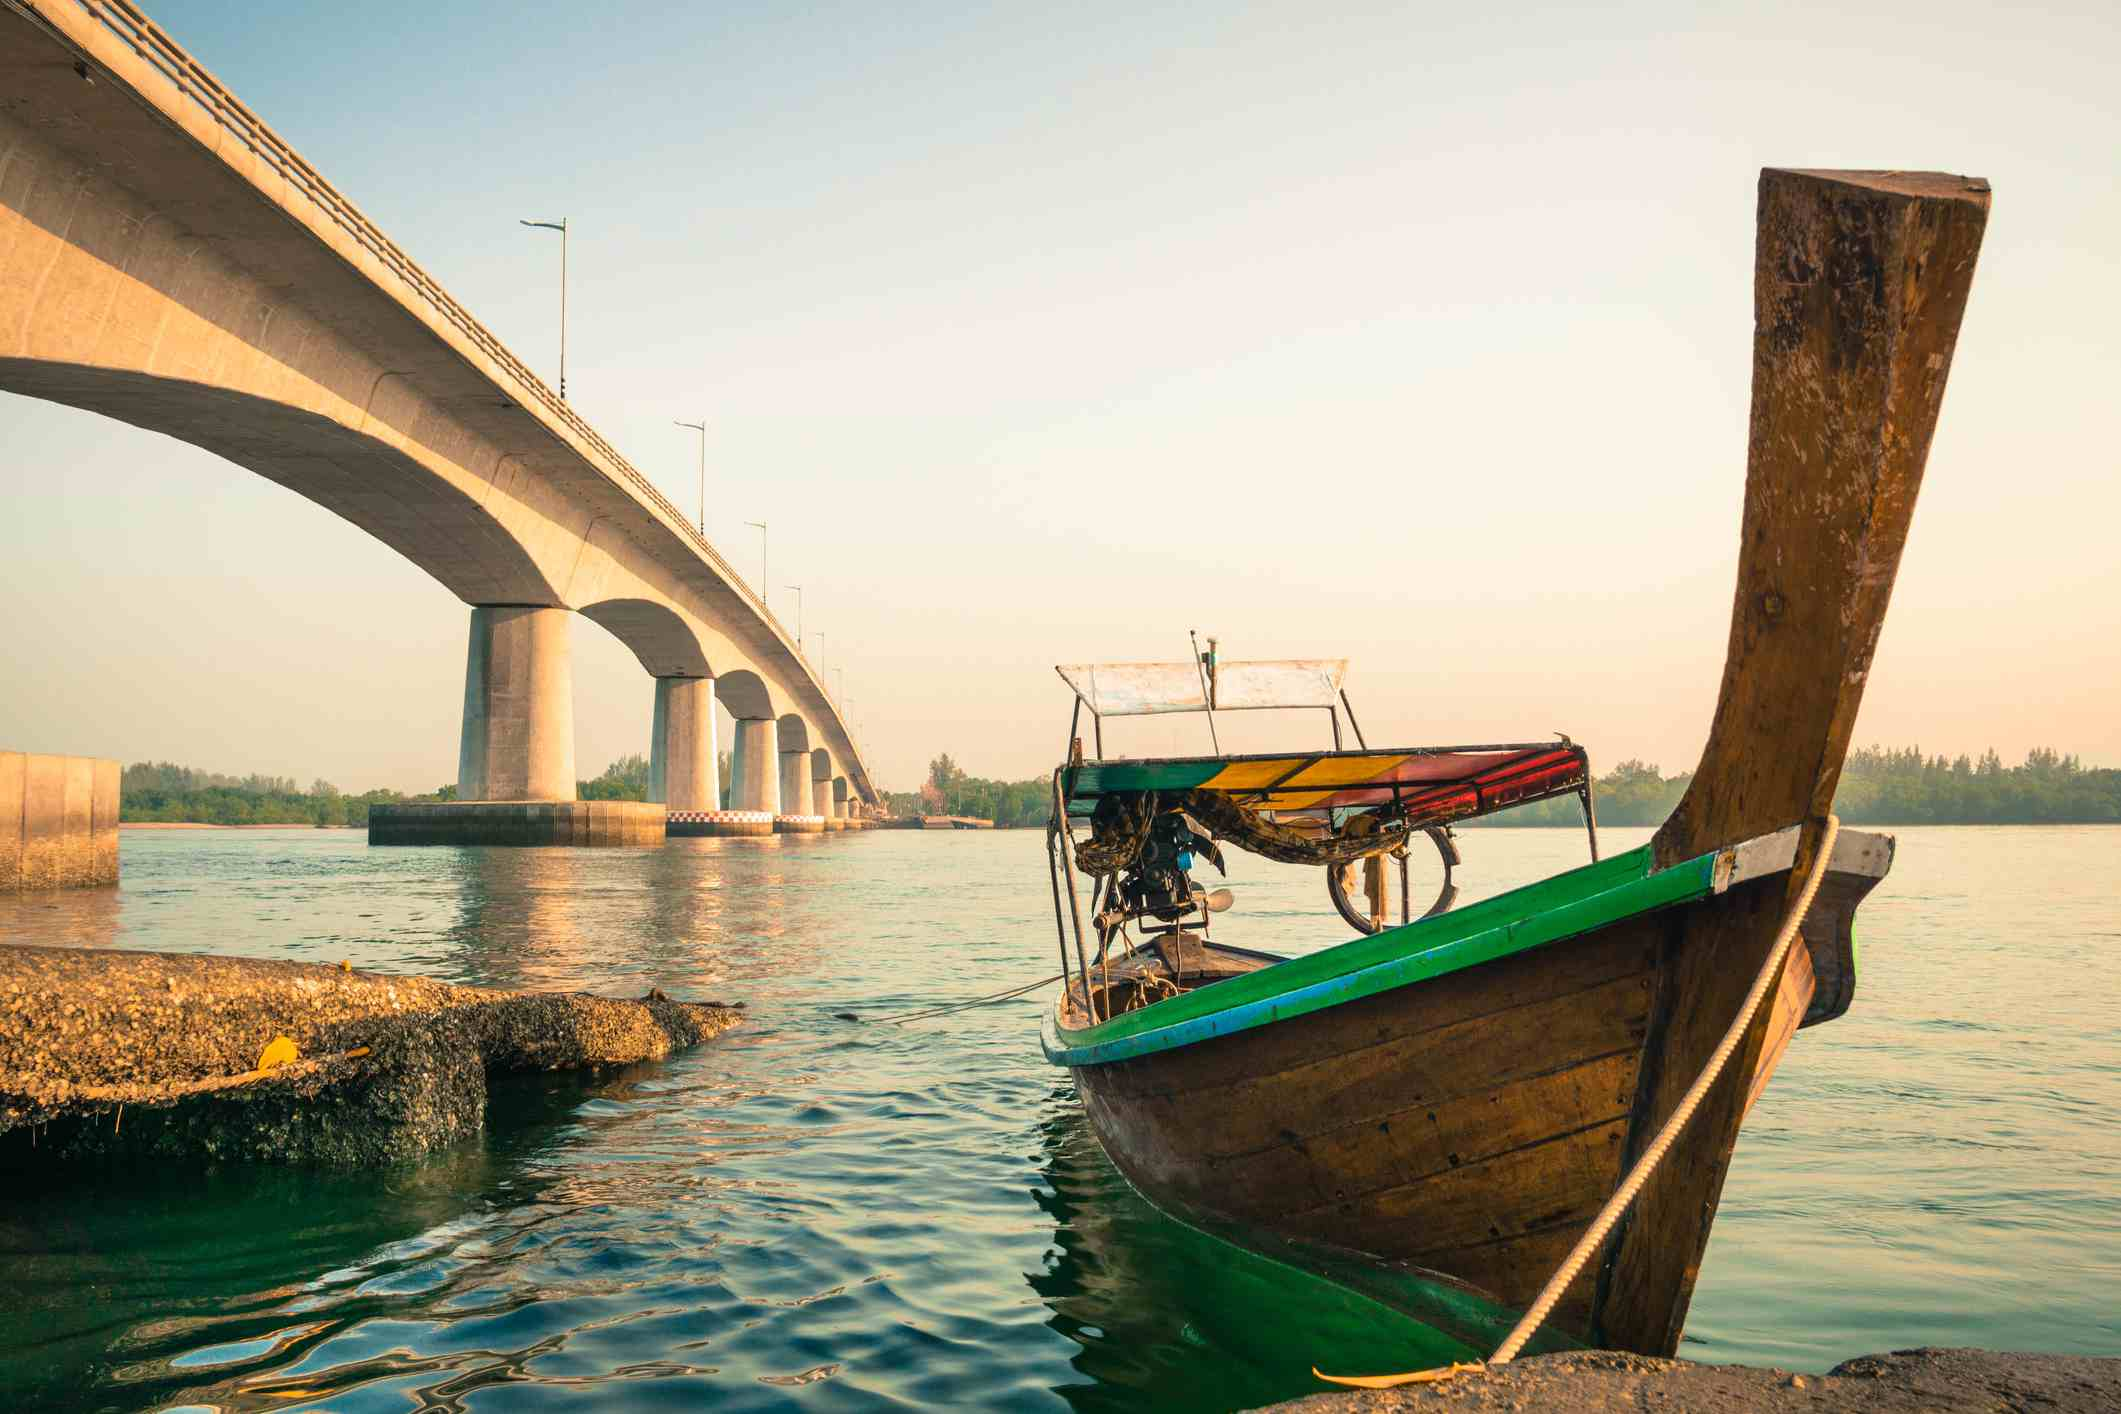 The bridge from Koh Lanta Noi and a traditional fishing boat, Koh Lanta, Tahiland